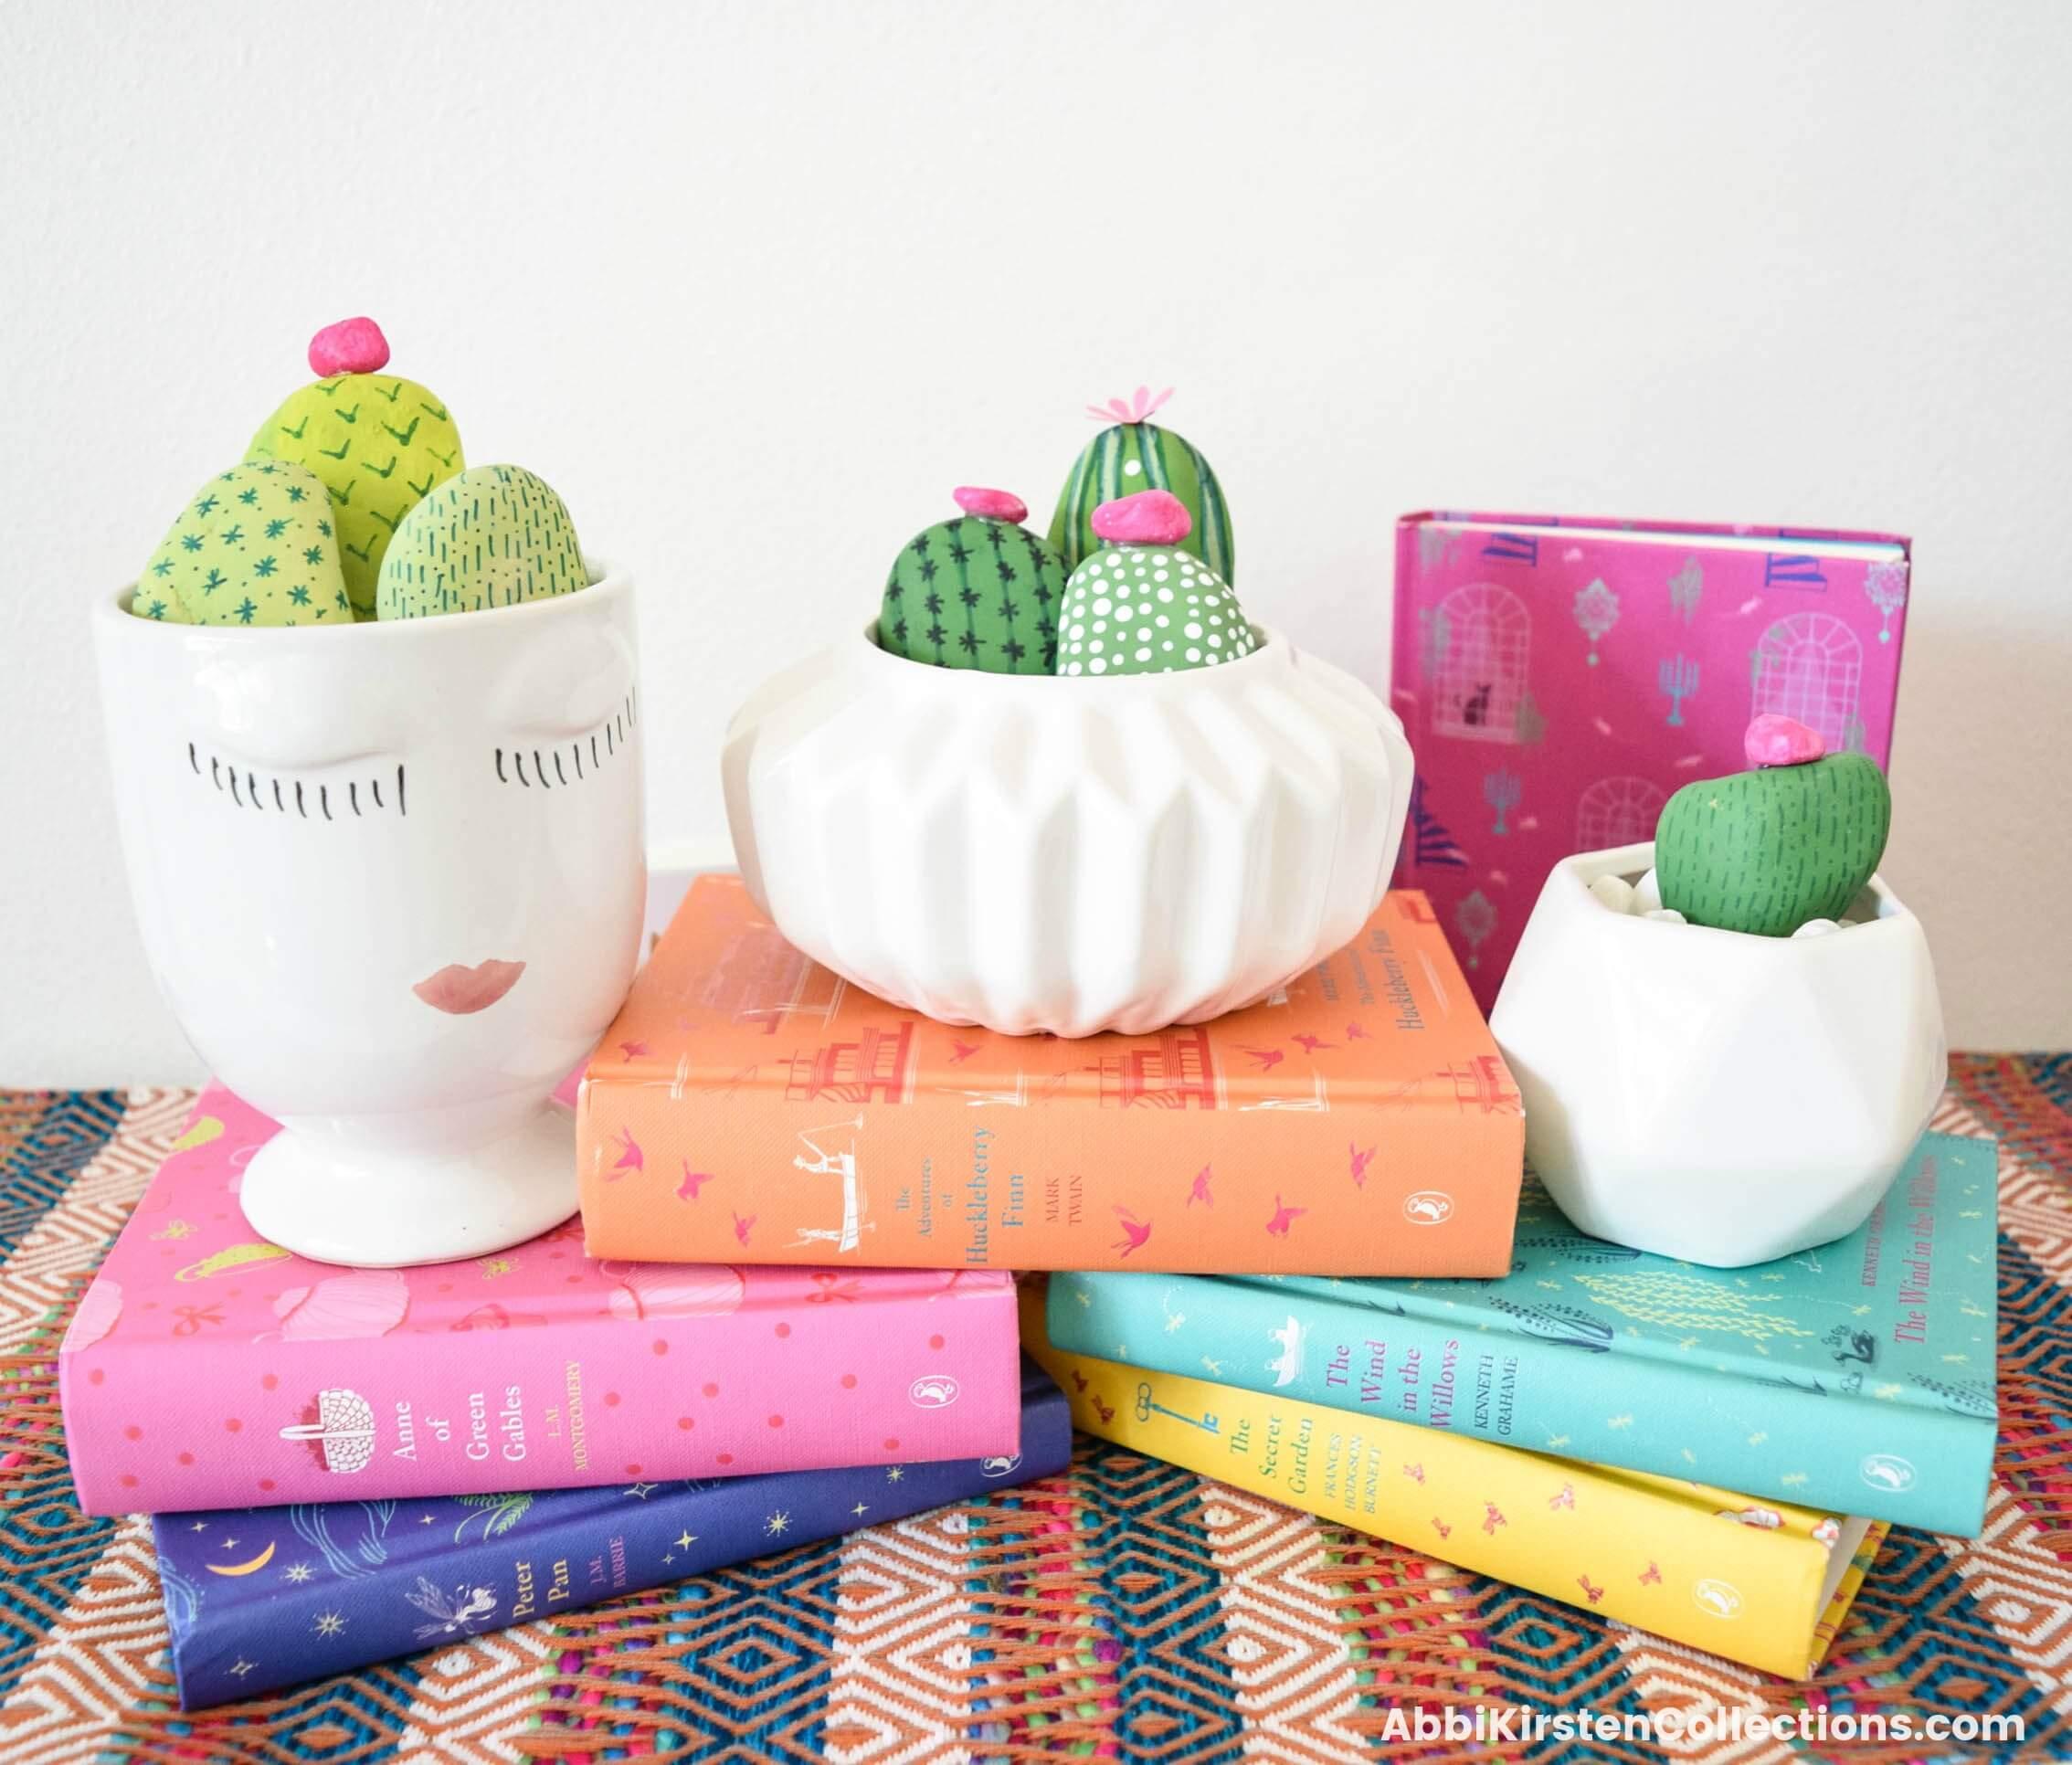 Easy Rock Painting Ideas + Cactus Rock Painting Tutorial